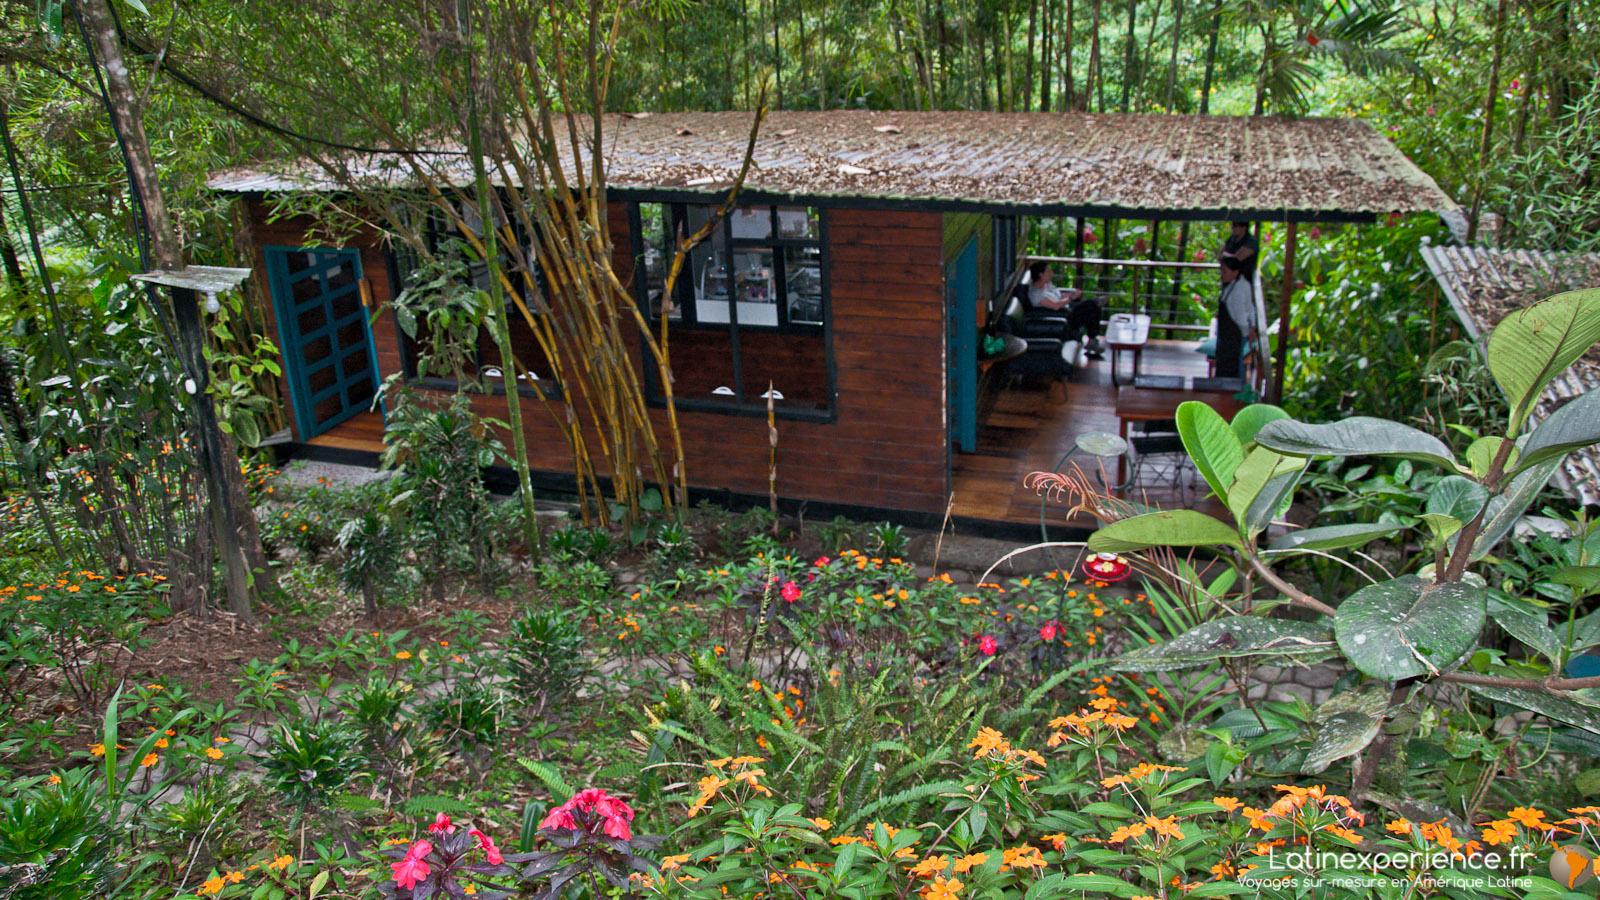 Equateur - Mindo - Septimo paraiso Xcolat - Latinexperience voyages